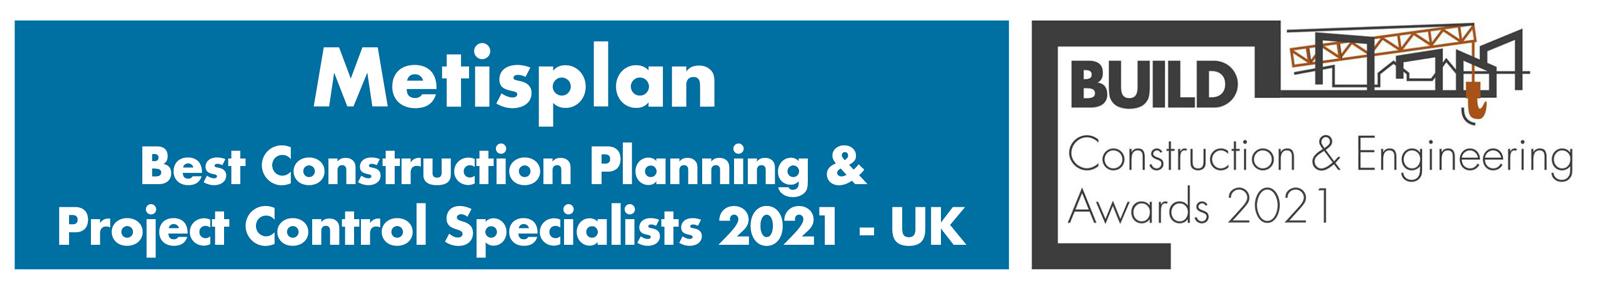 Metisplan-Construction-Engineering-Awards-2021-blue